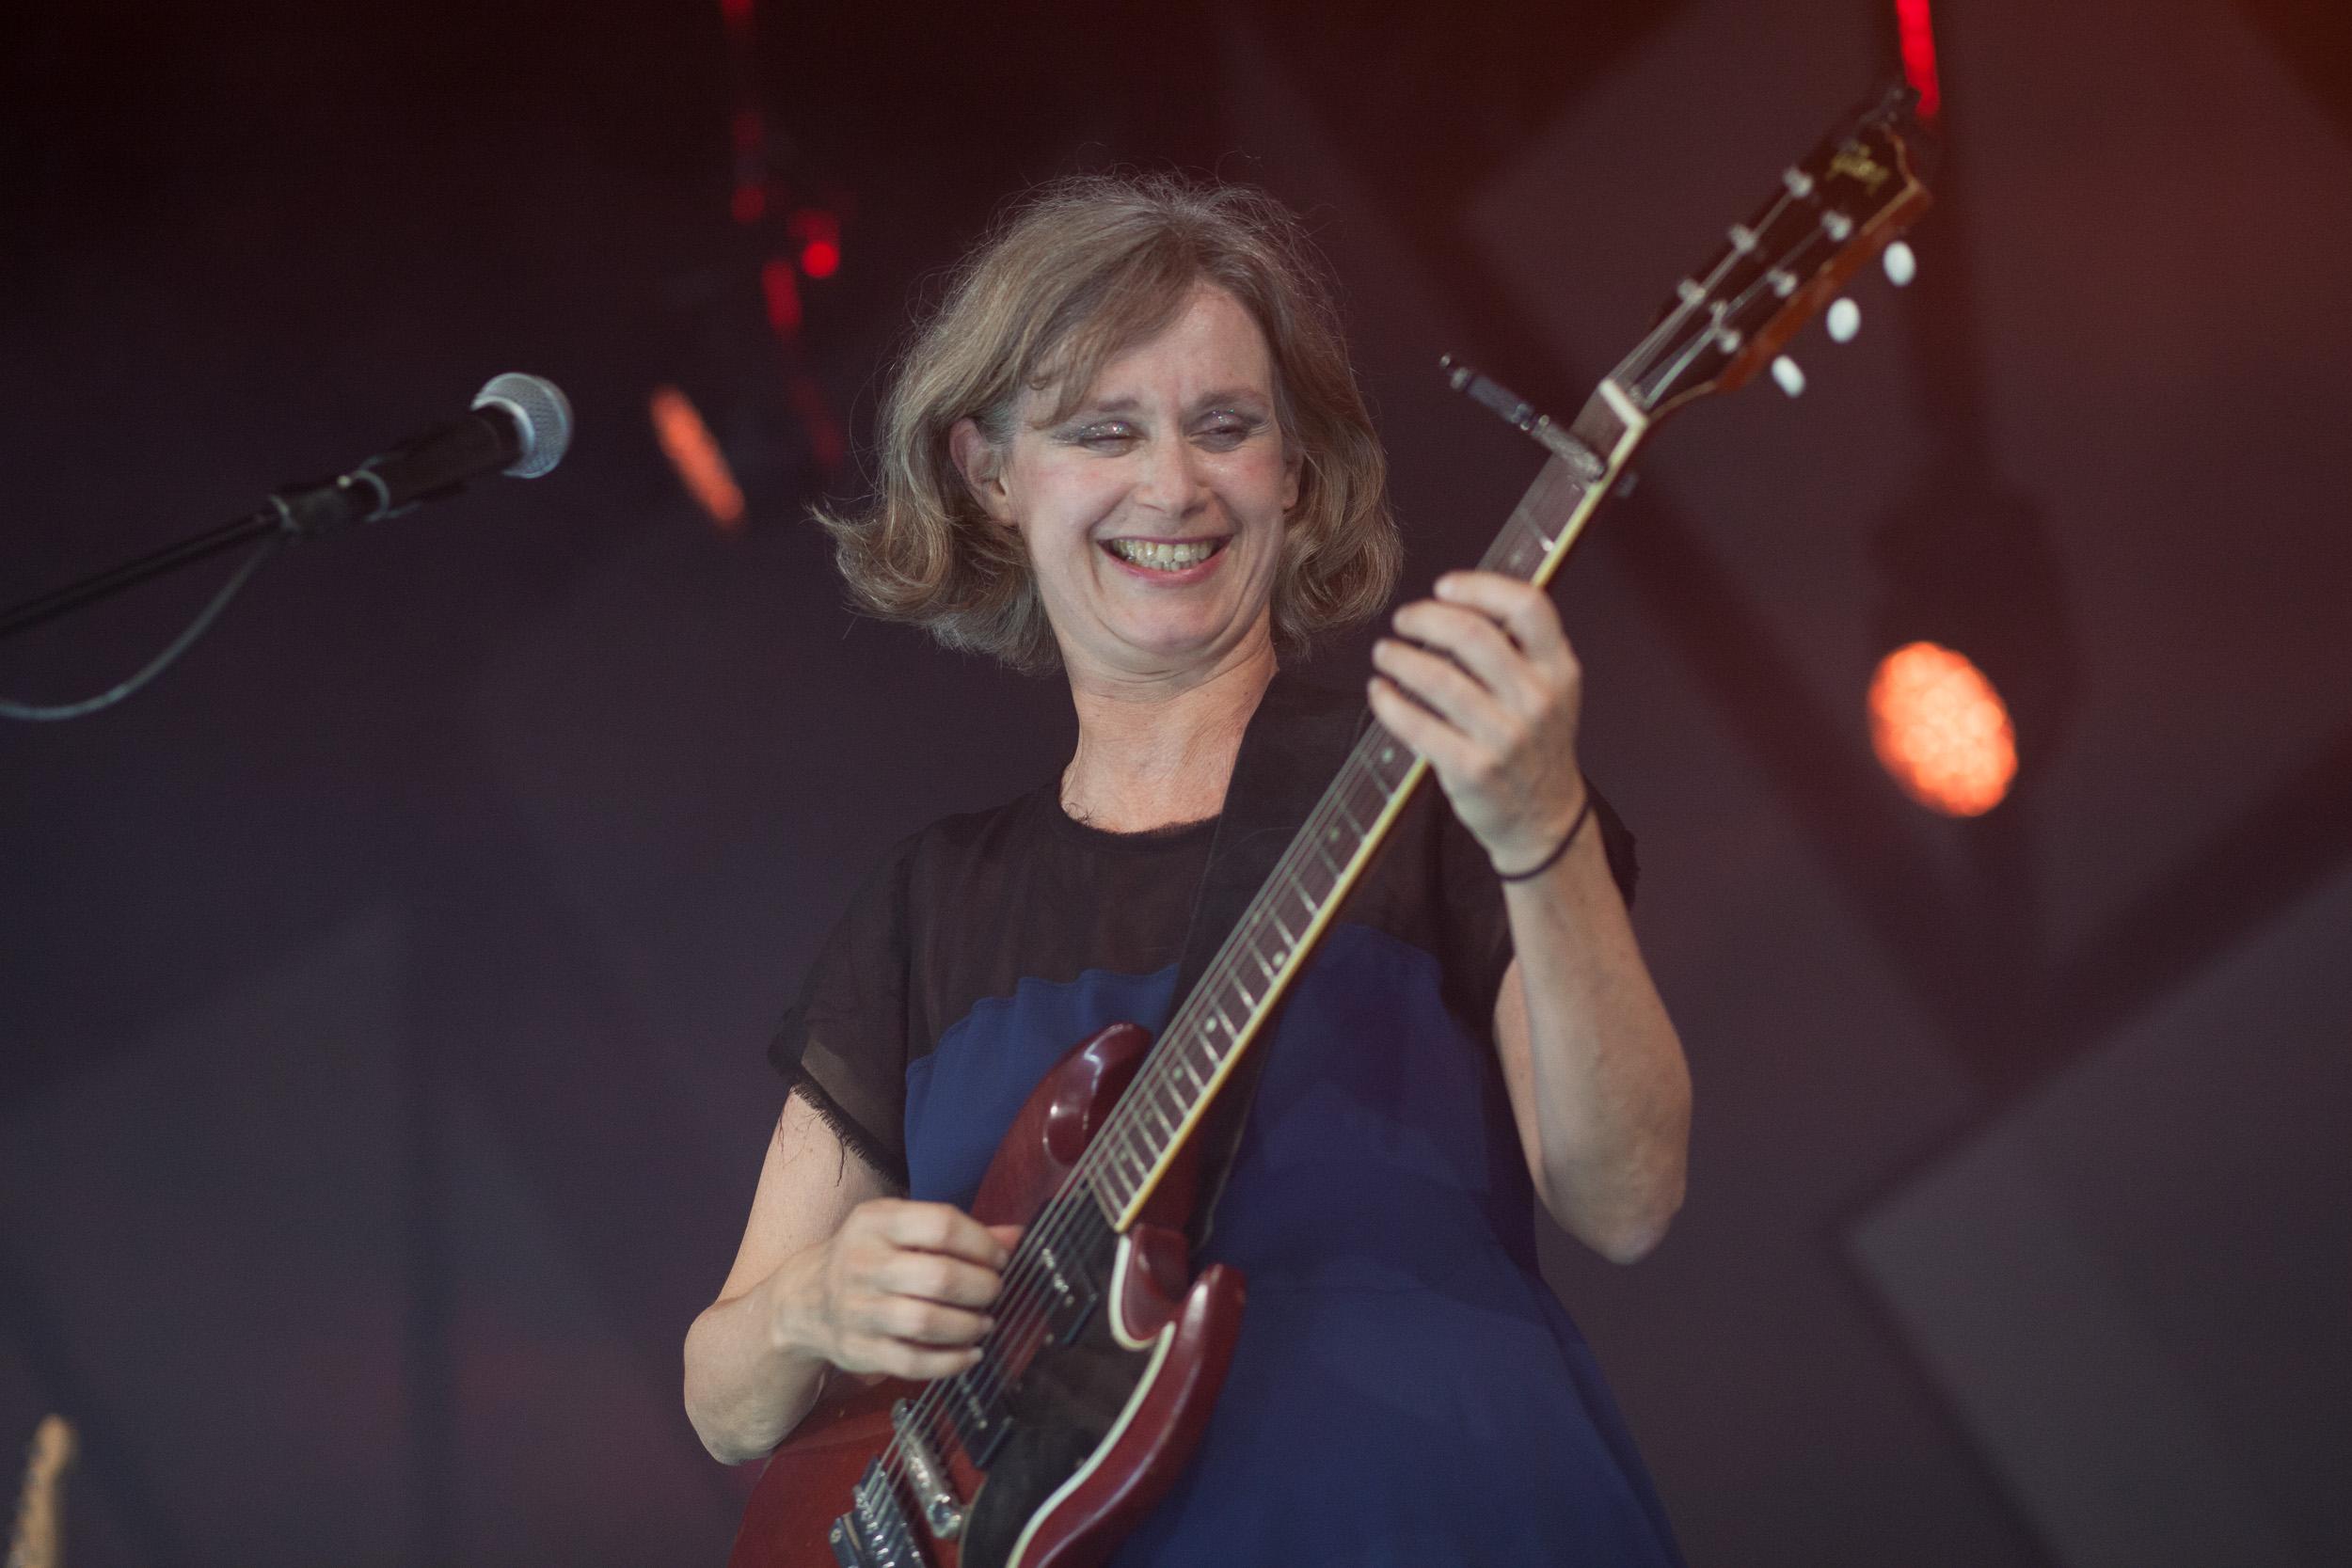 Juana Molina live at Roskilde Festival 2018